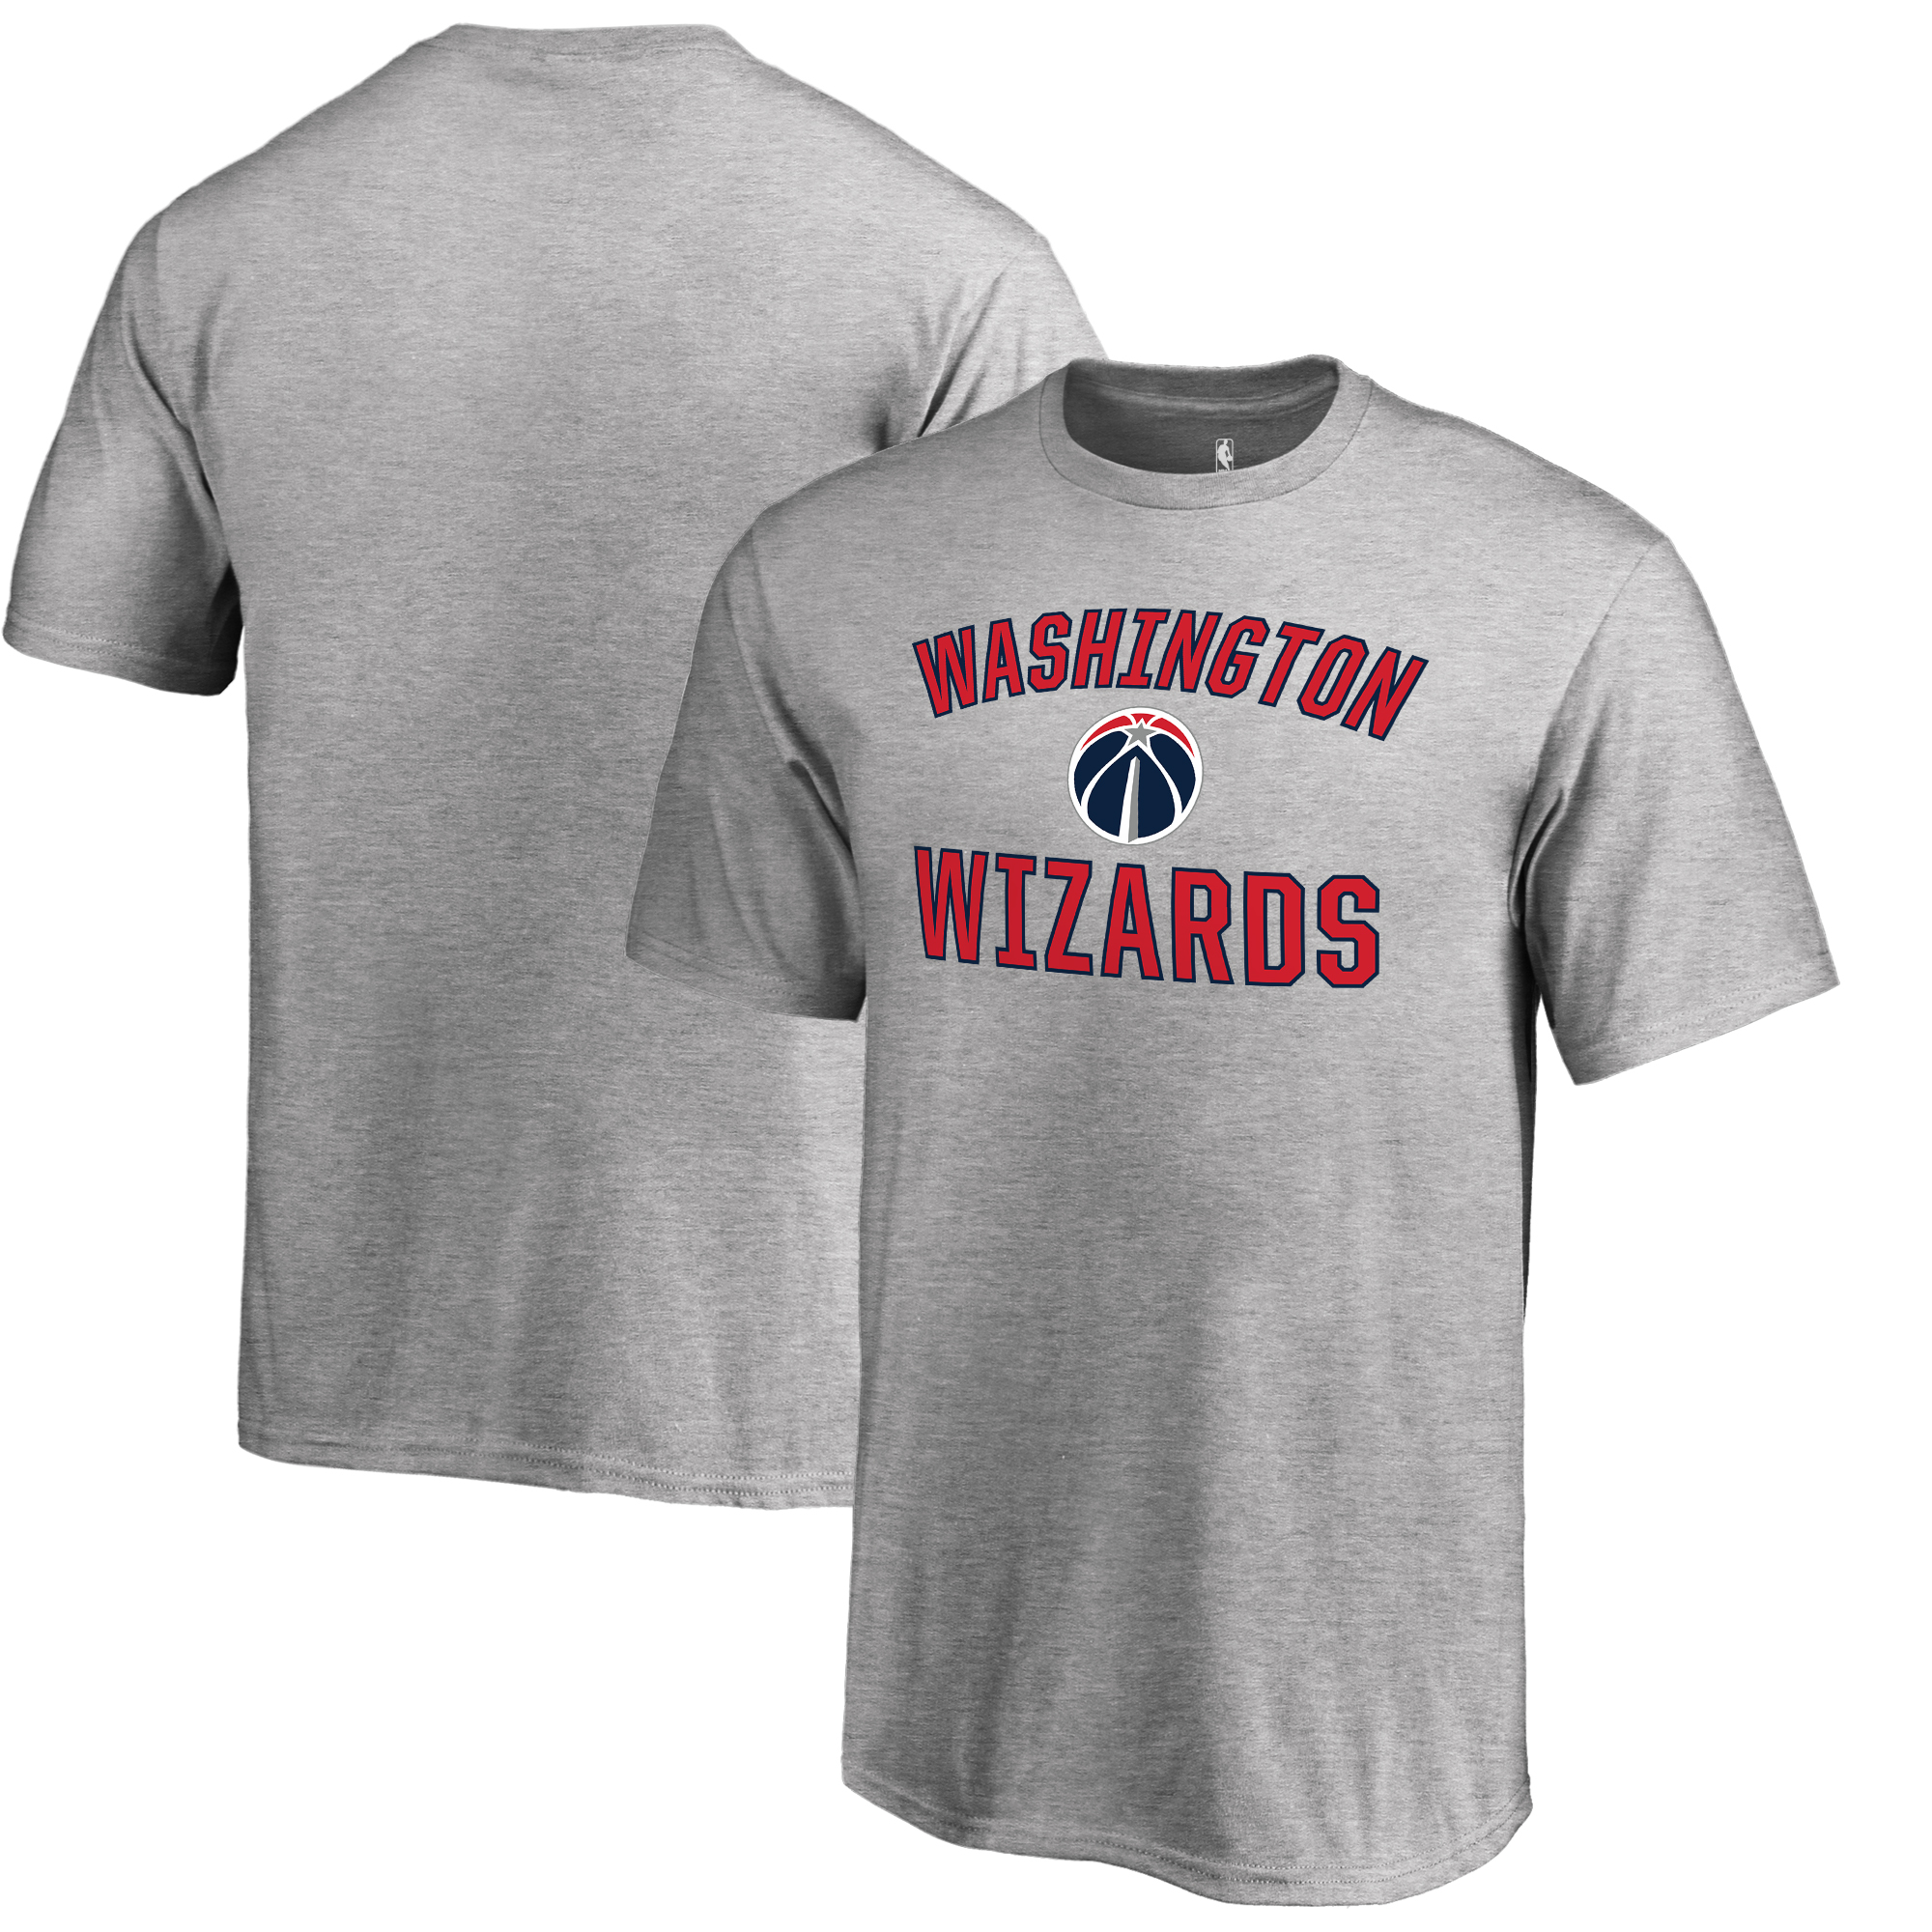 Washington Wizards Fanatics Branded Youth Victory Arch T-Shirt - Heathered Gray